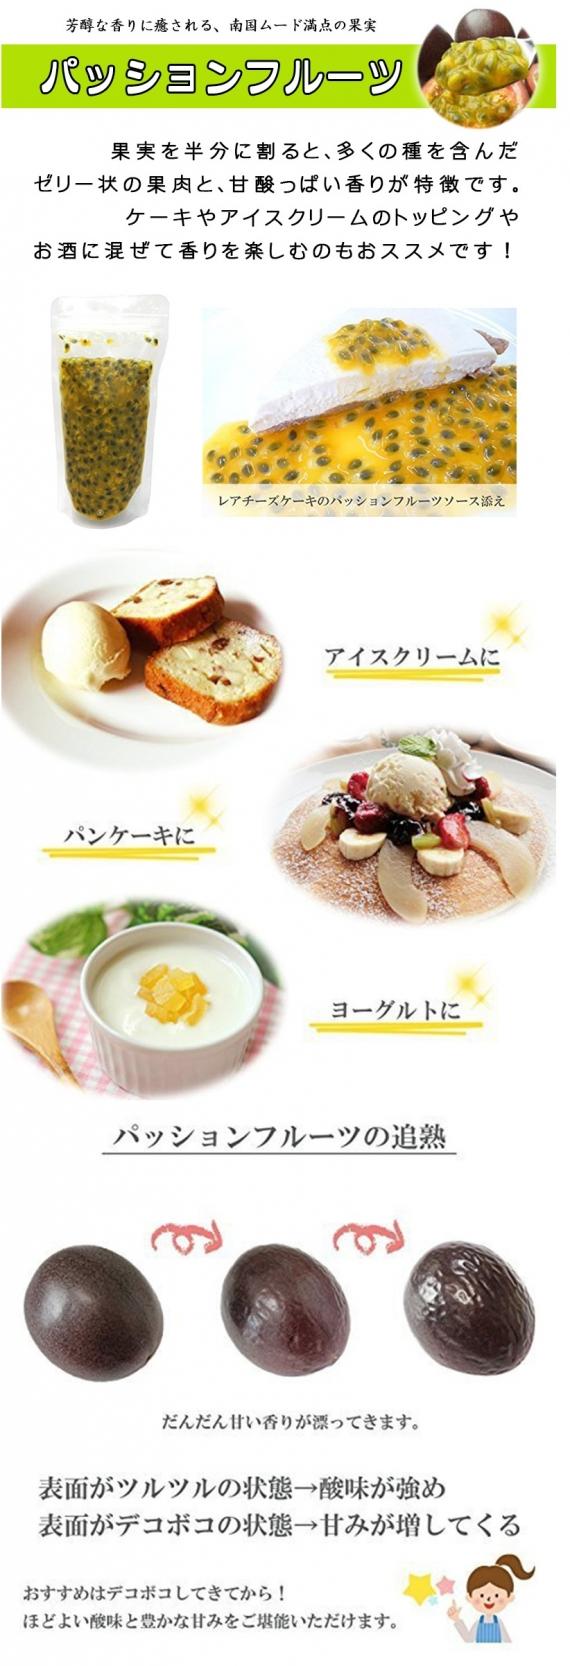 <47CLUB> 冷凍 沖縄県産 パッションフルーツ 原液 500g×1袋 非加熱 使い方いろいろ ほどよい酸味が特徴のパッションフルーツ果汁 スイーツや料理のソースに OLBG-OLPFP-0500-NM-001画像